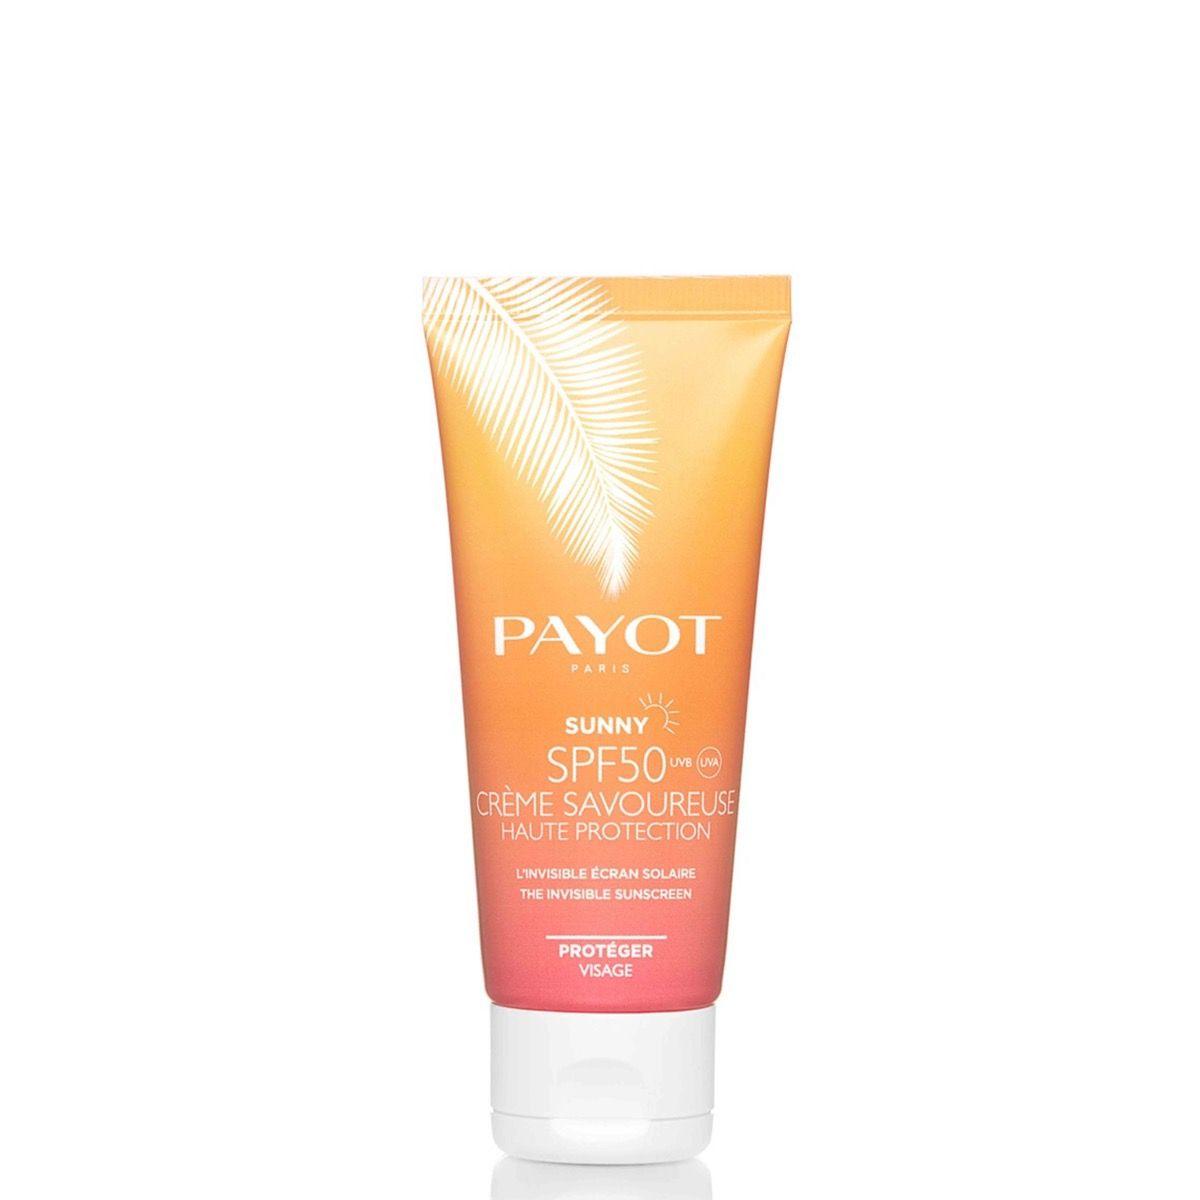 Payot Sunny SPF 50 Creme Savoureuse Gezichtscrème